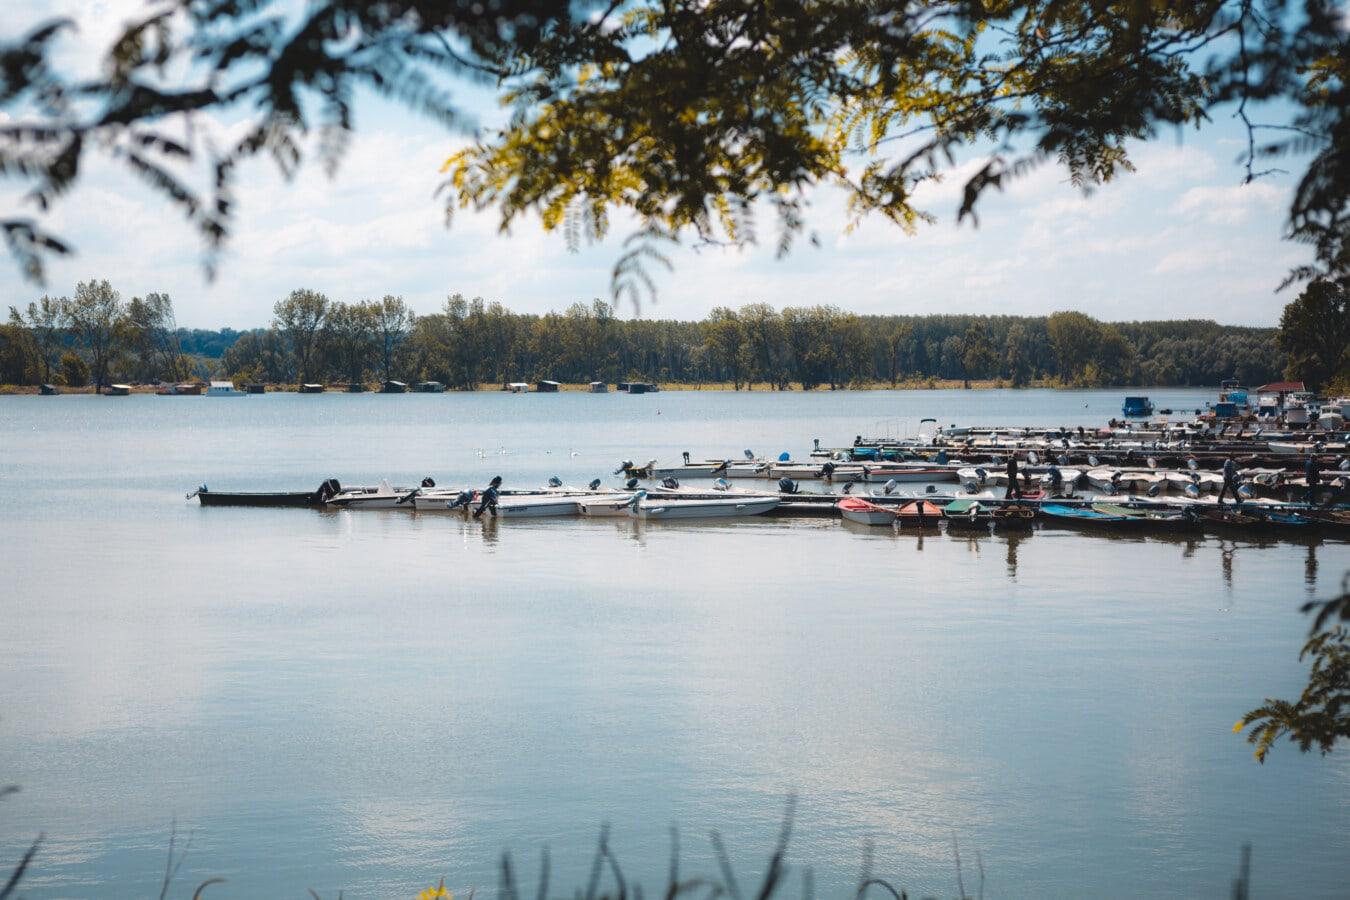 riverbank, dock, river boat, harbor, lake, water, river, reflection, watercraft, outdoors